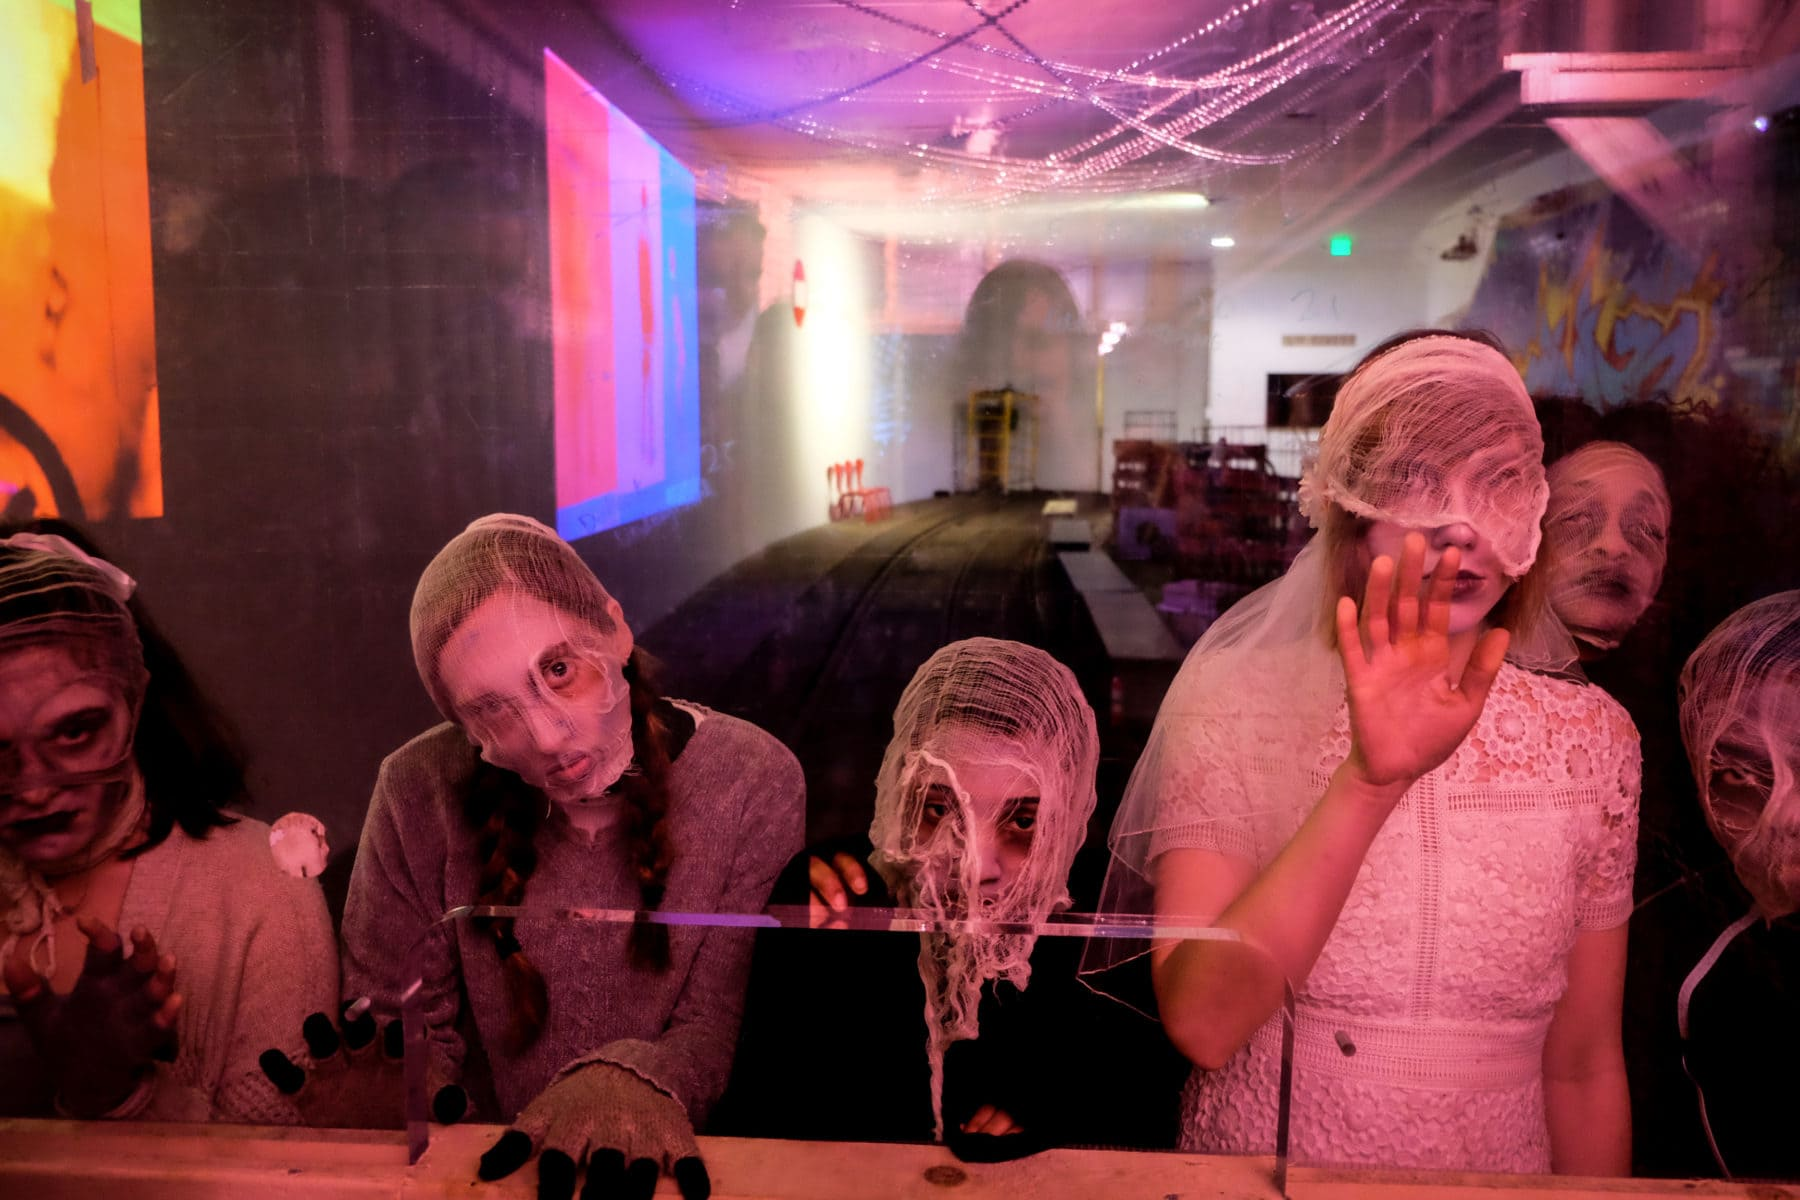 TBD Immersive's 'Under(world) performs through May 12 at Dupont Underground. Photo by Deborah Lash.